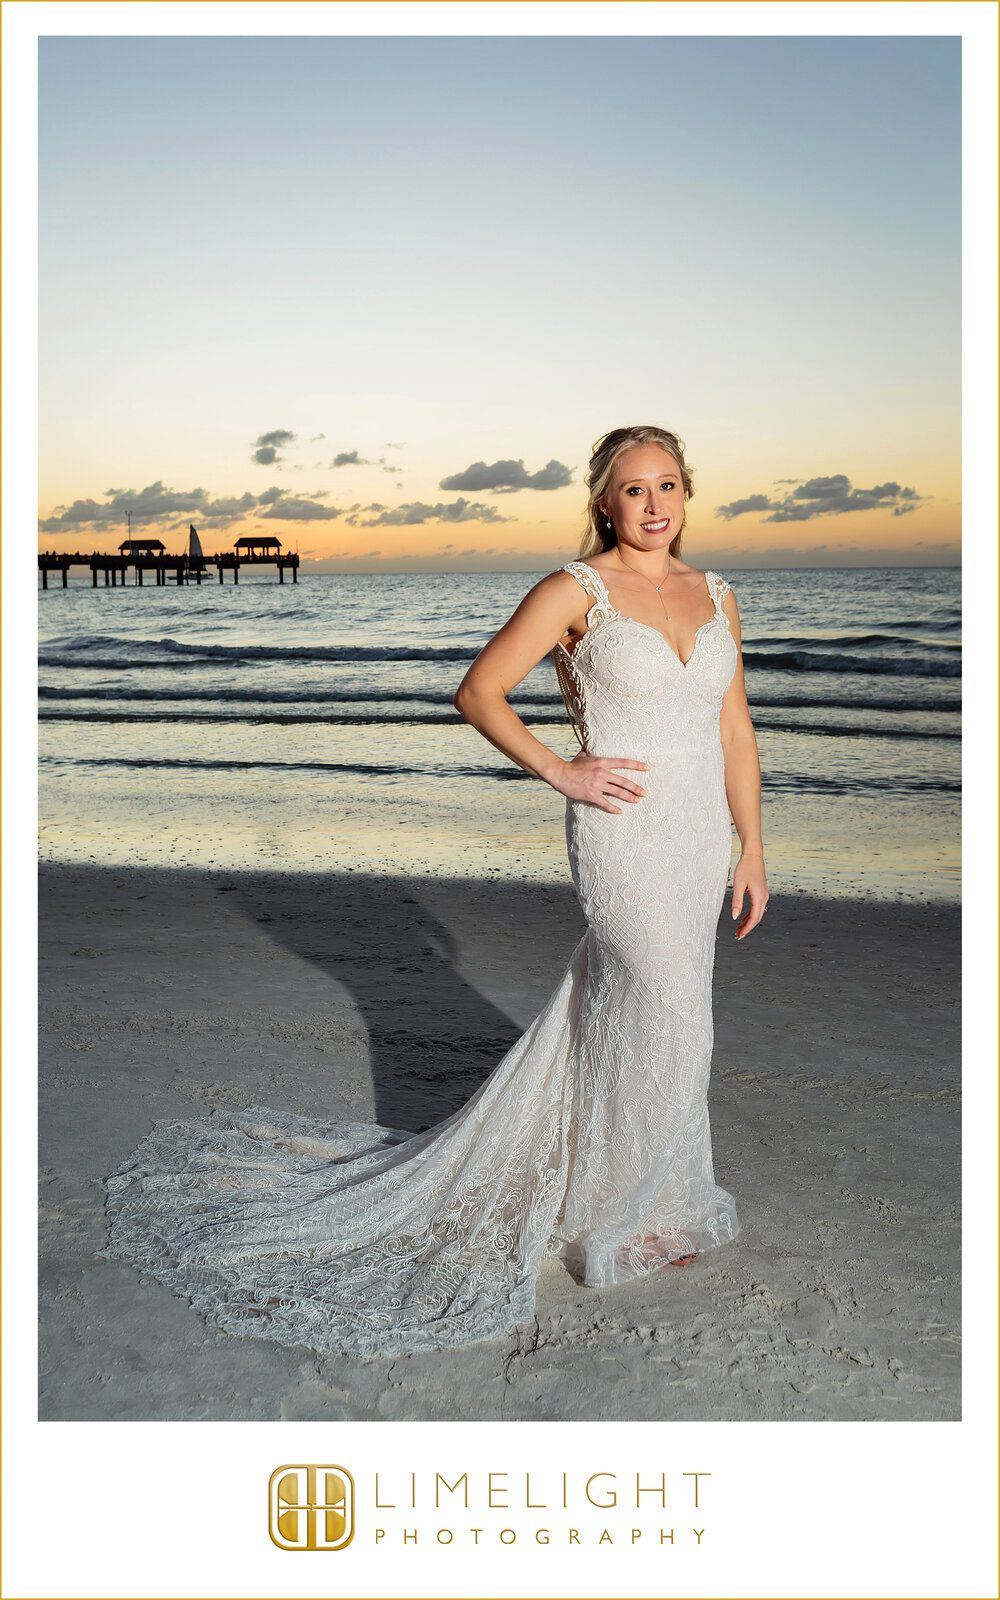 step into the limelight, limelight photography, wedding, wedding photography, bride, groom, marriage, wedding inspo, wedding photoshoot, couple, relat…